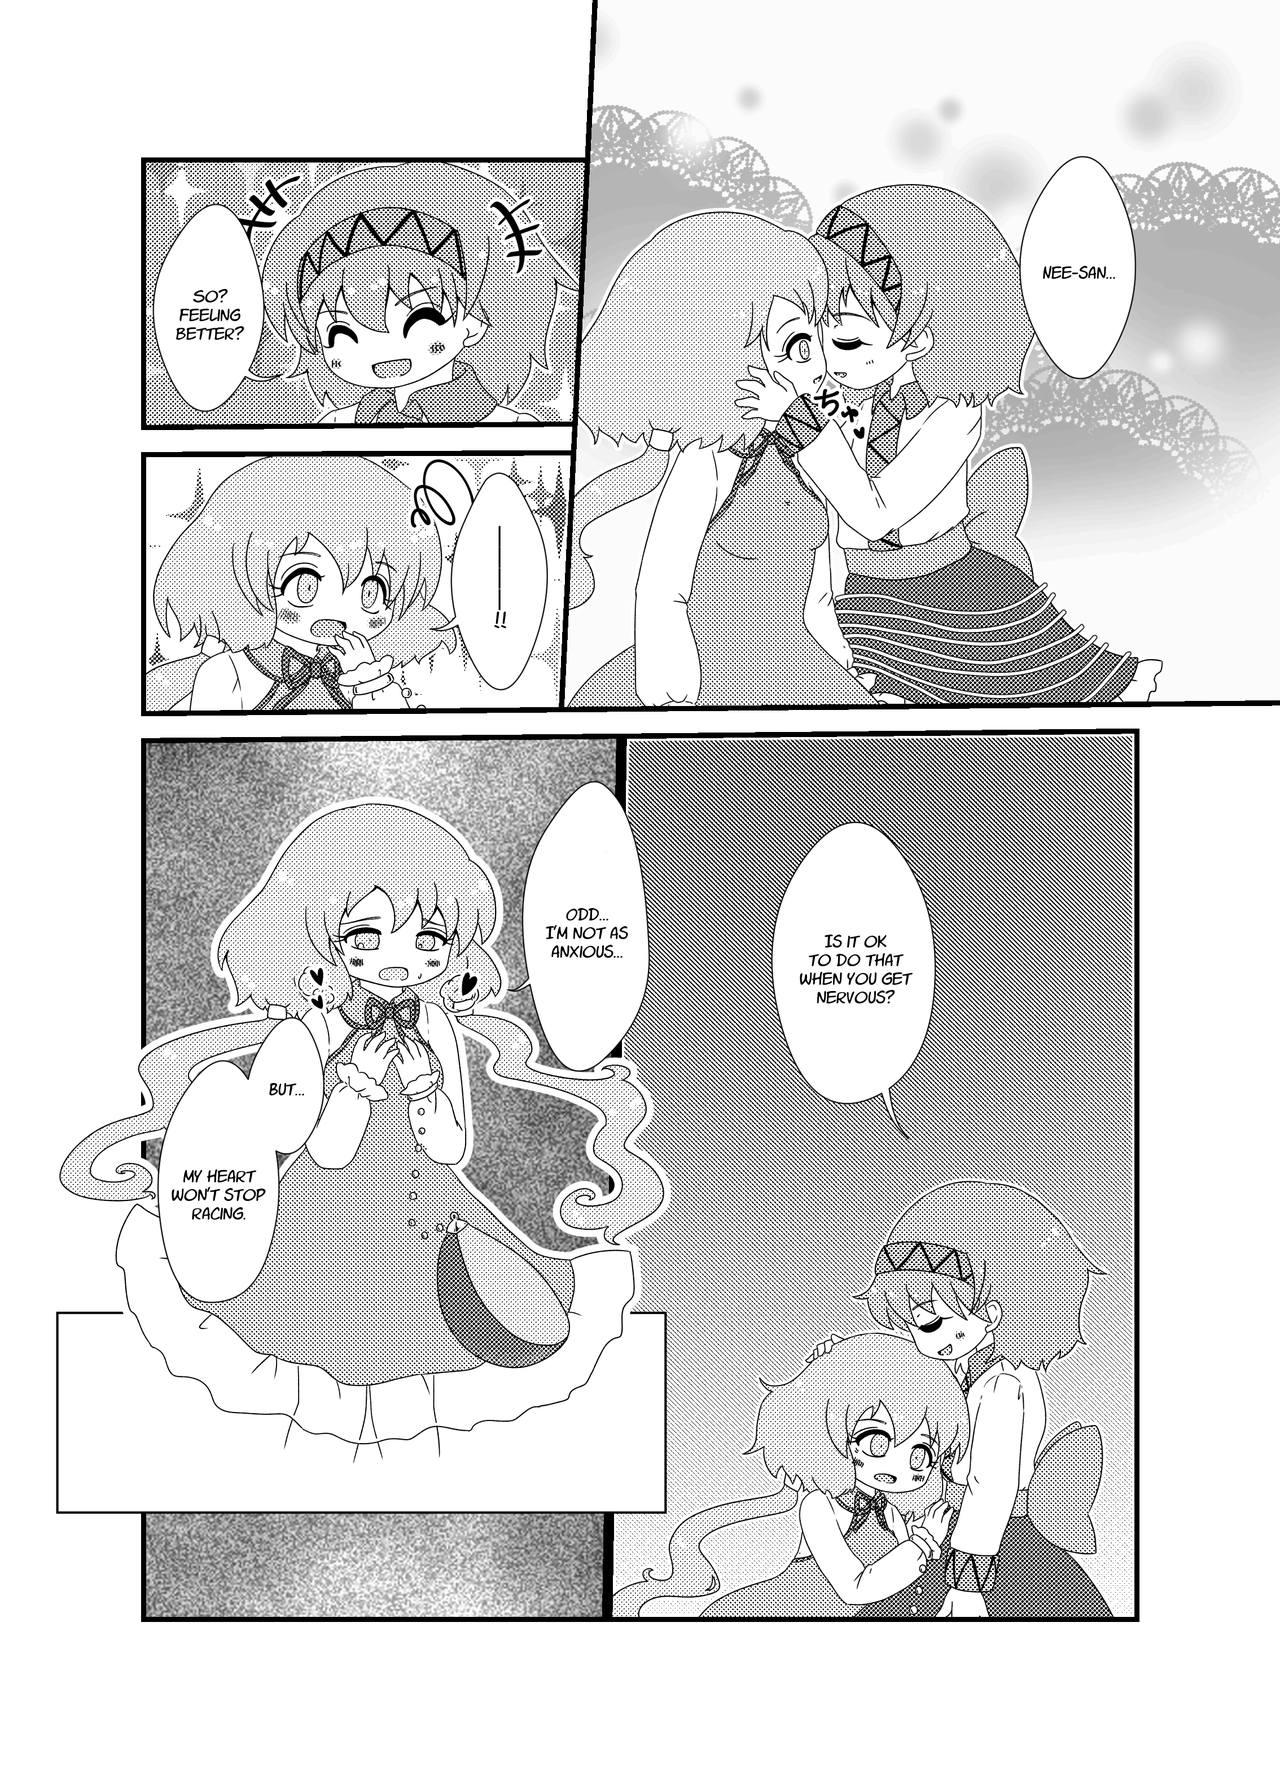 Kimi Houkou e   Toward You 3